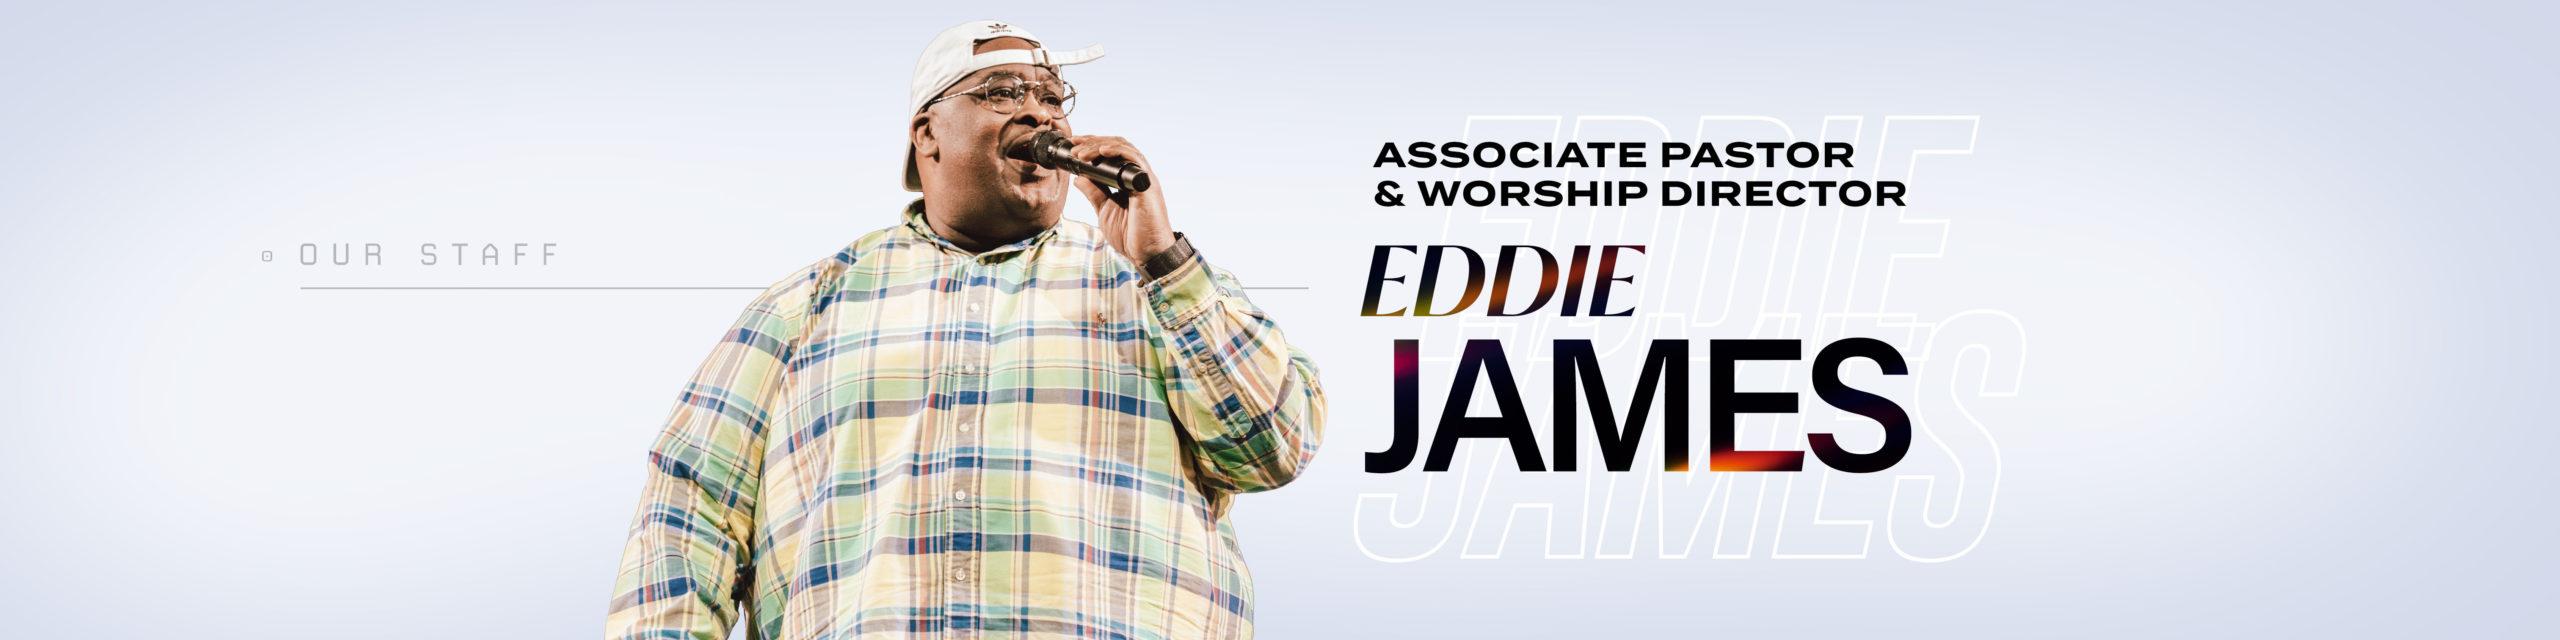 Associate Pastor and Worship Director Eddie James of Nations Church Orlando